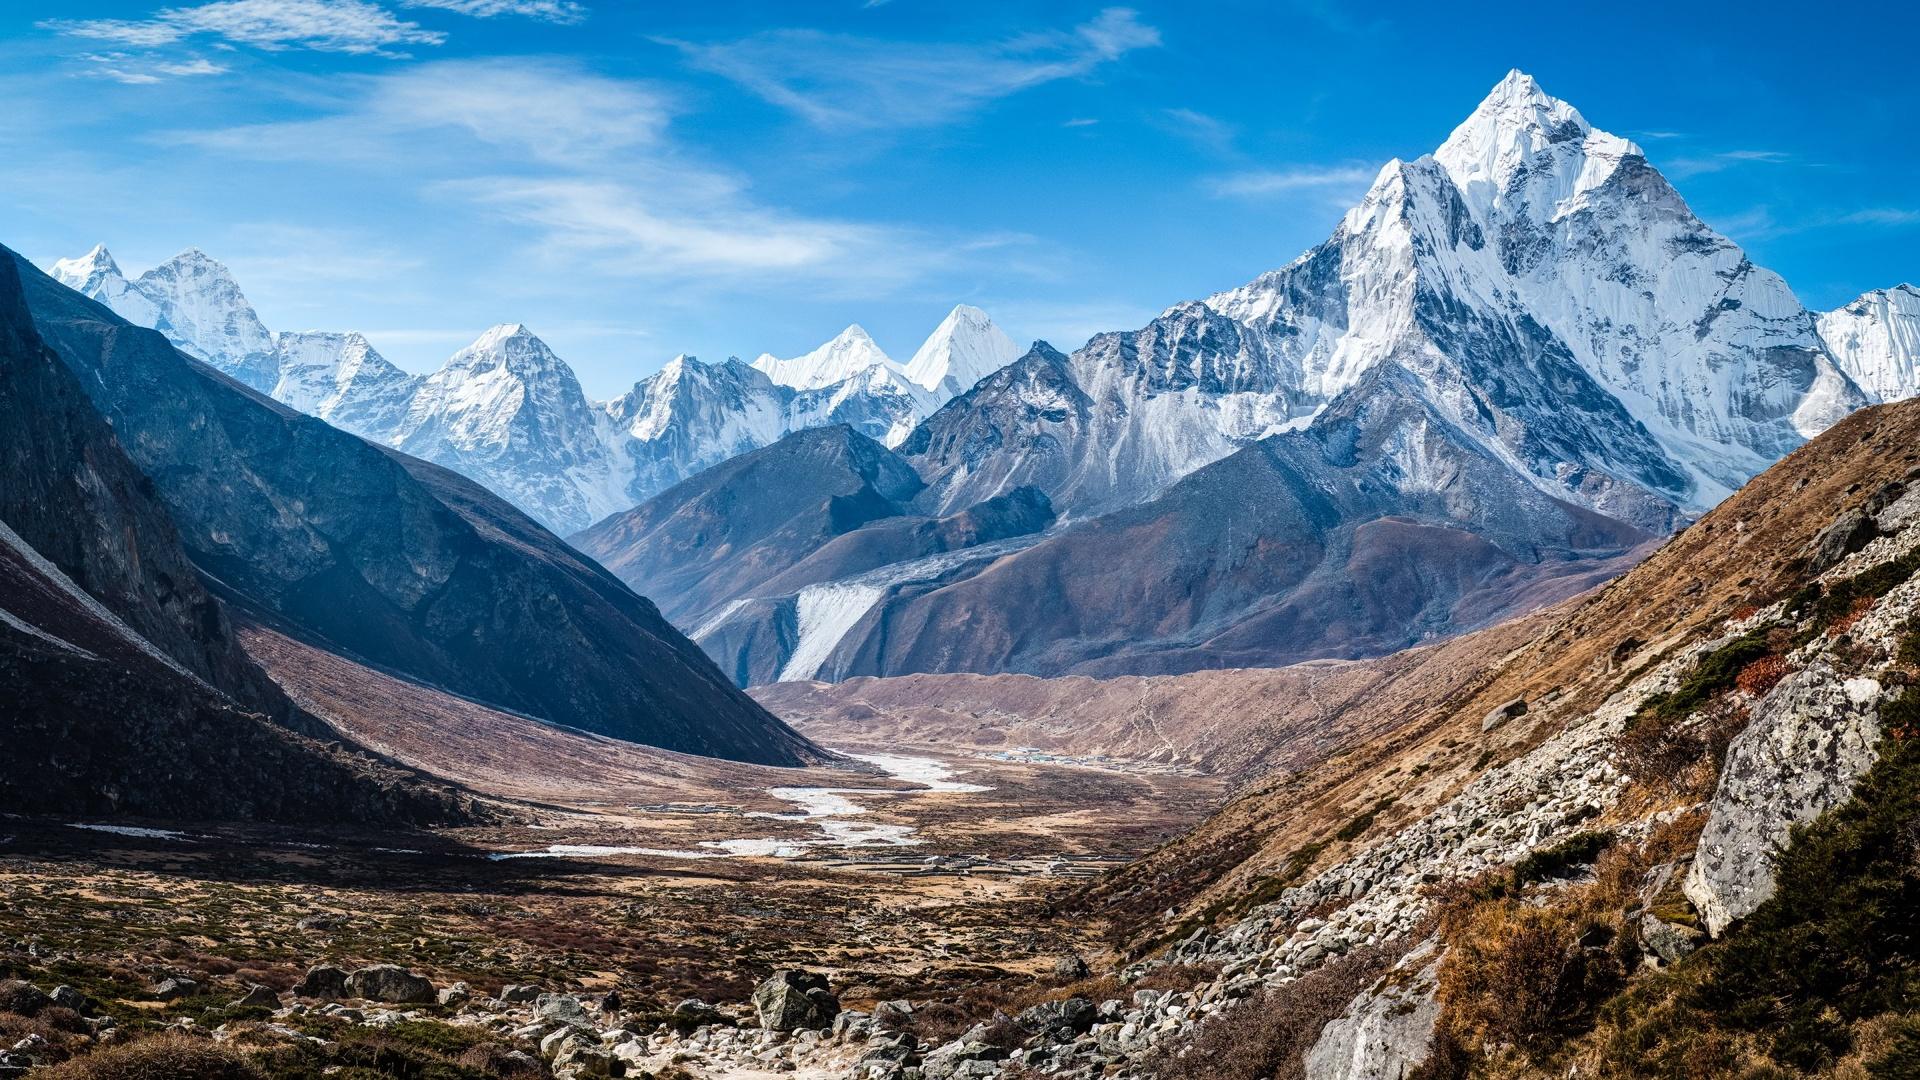 Wallpapers Landscape Himalayas Wallpaper 1920x1080